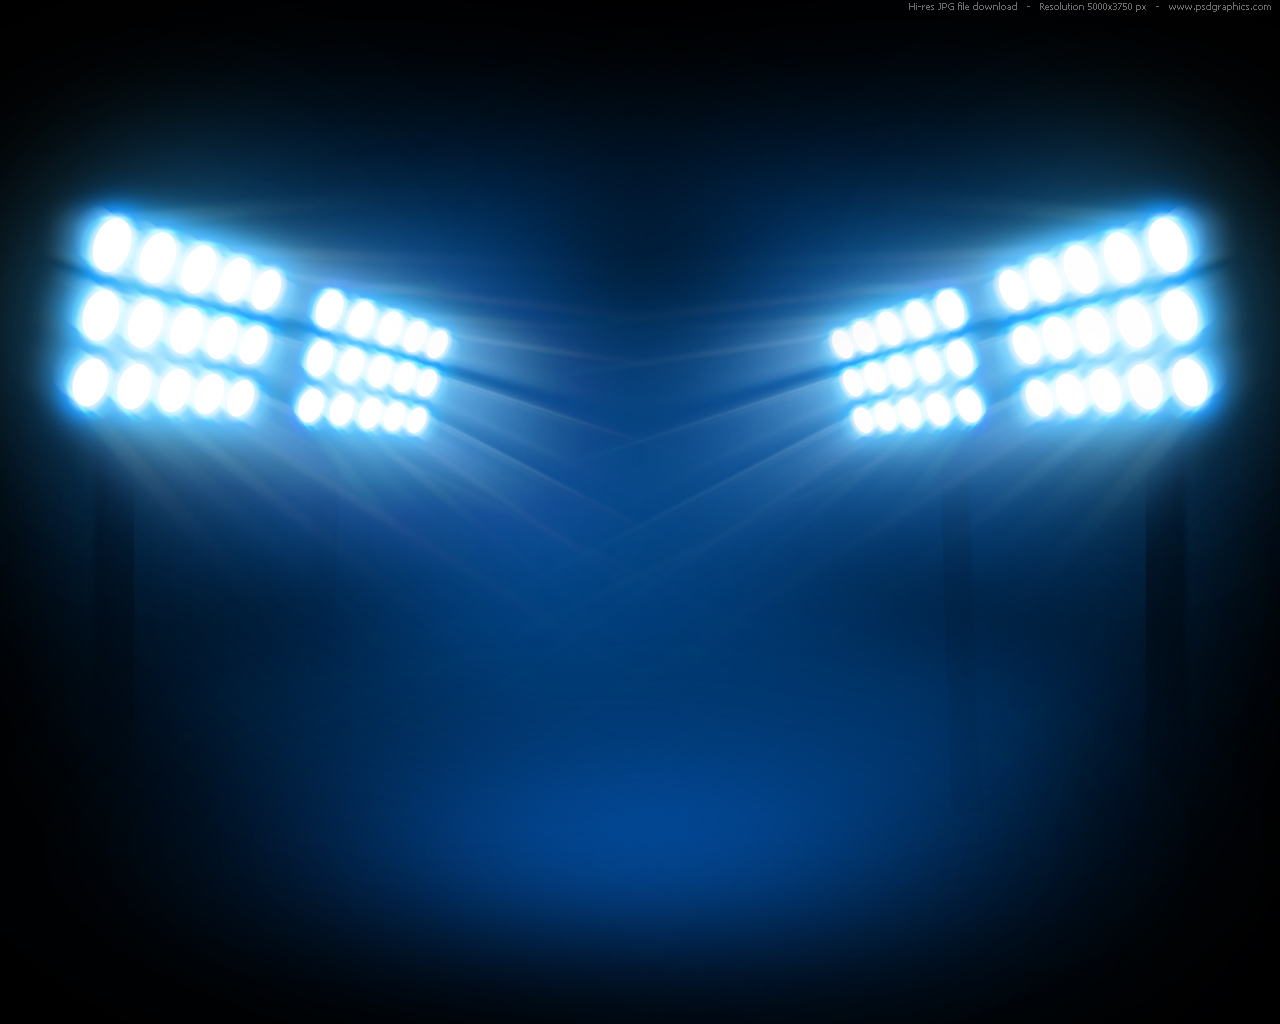 Football clipart light High PSDGraphics School backgrounds backgrounds